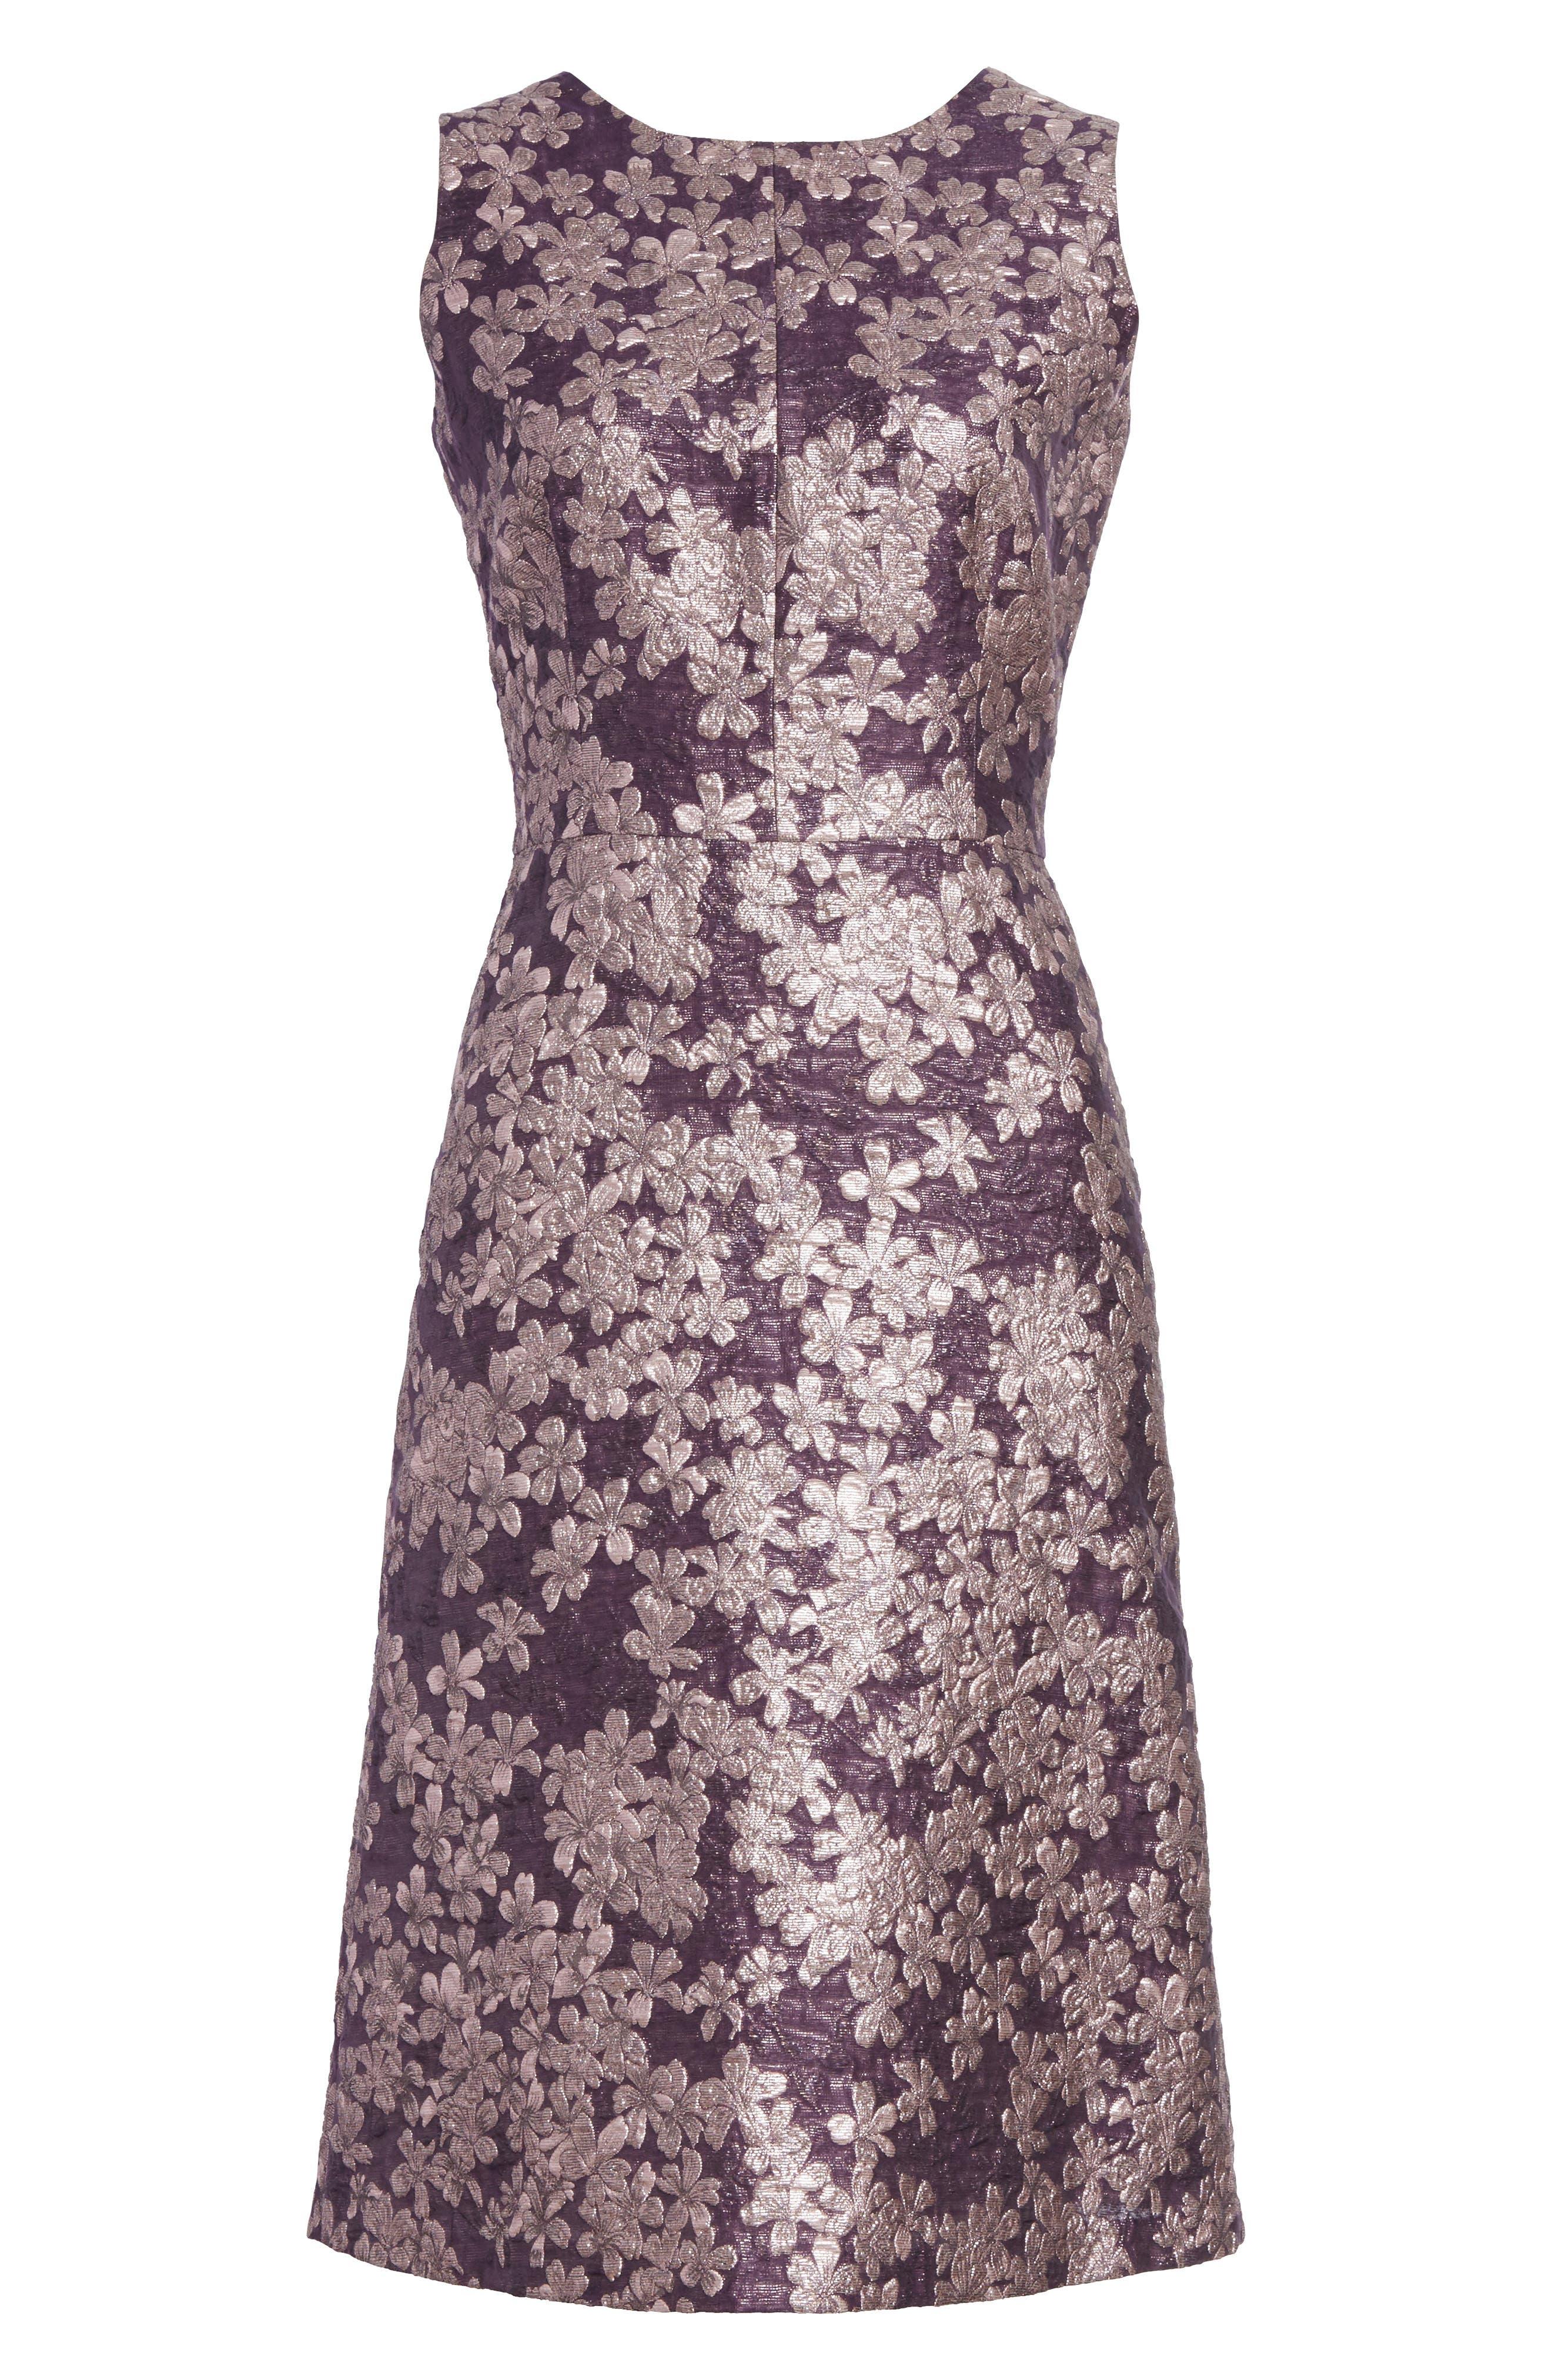 Metallic Floral Jacquard Dress,                             Alternate thumbnail 6, color,                             560